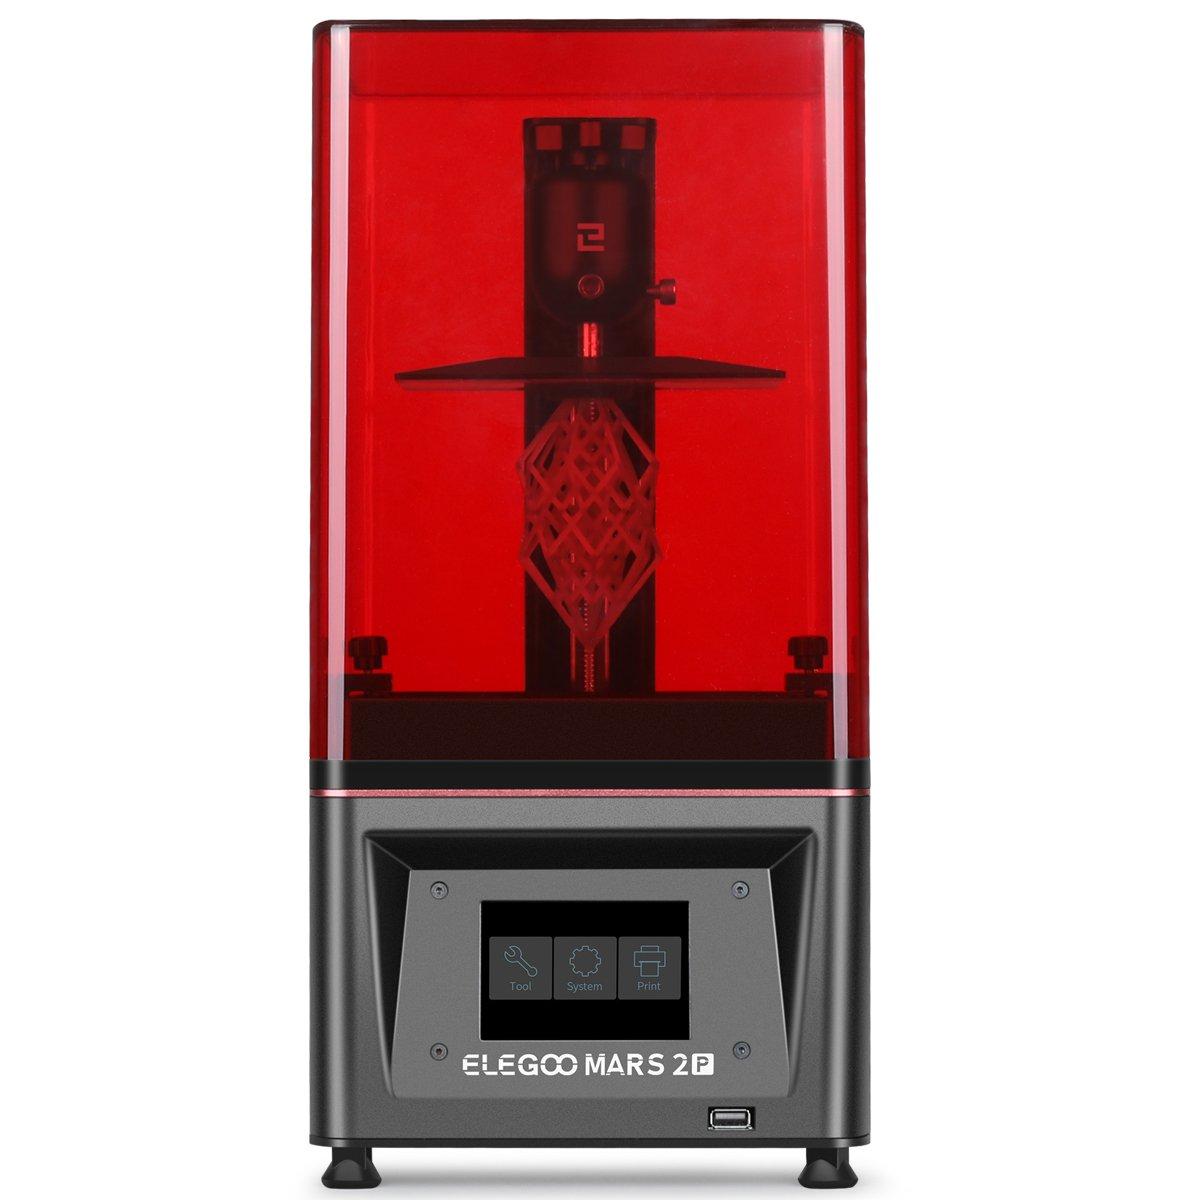 ELEGOO Mars 2 Pro Mono LCD MSLA Resin 3D Printer with Air Purifier – ELEGOO Official